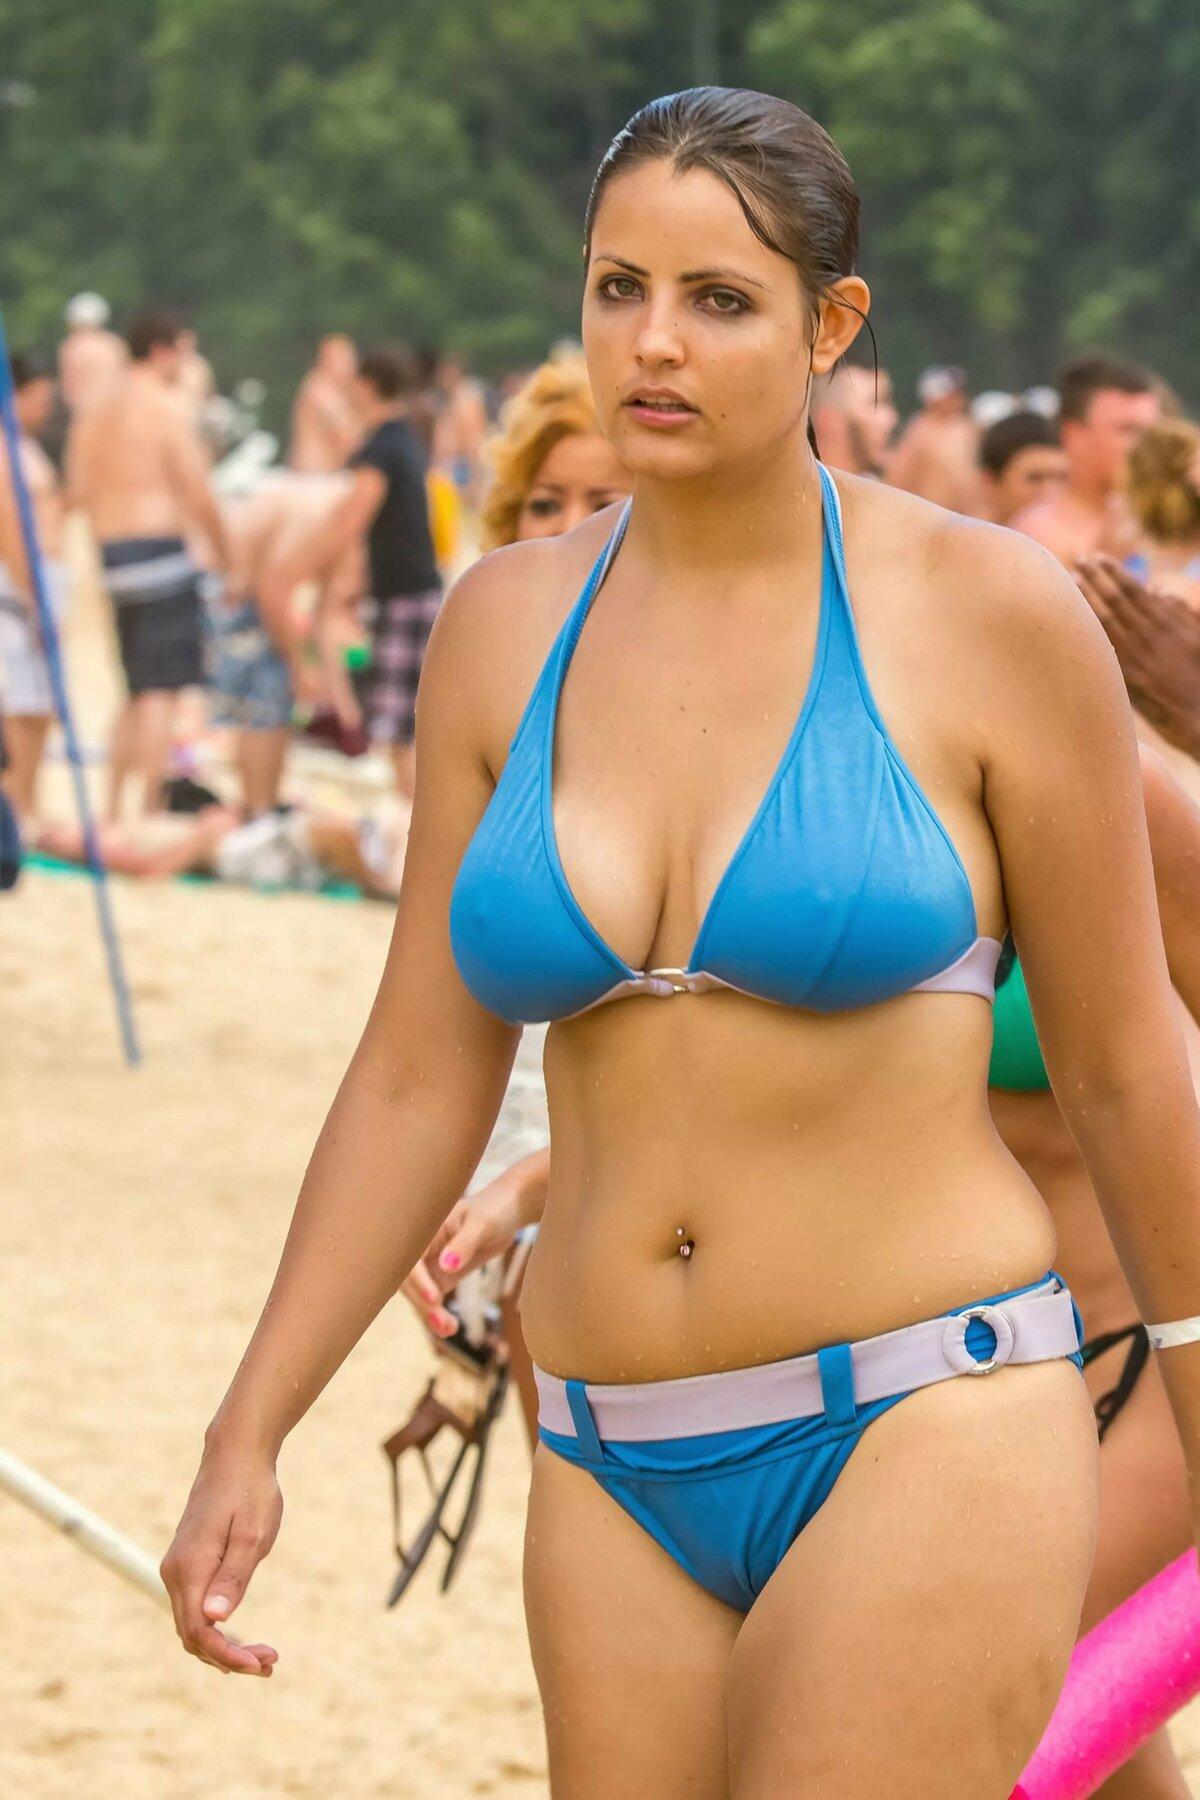 Amateur bikini post sexo pics